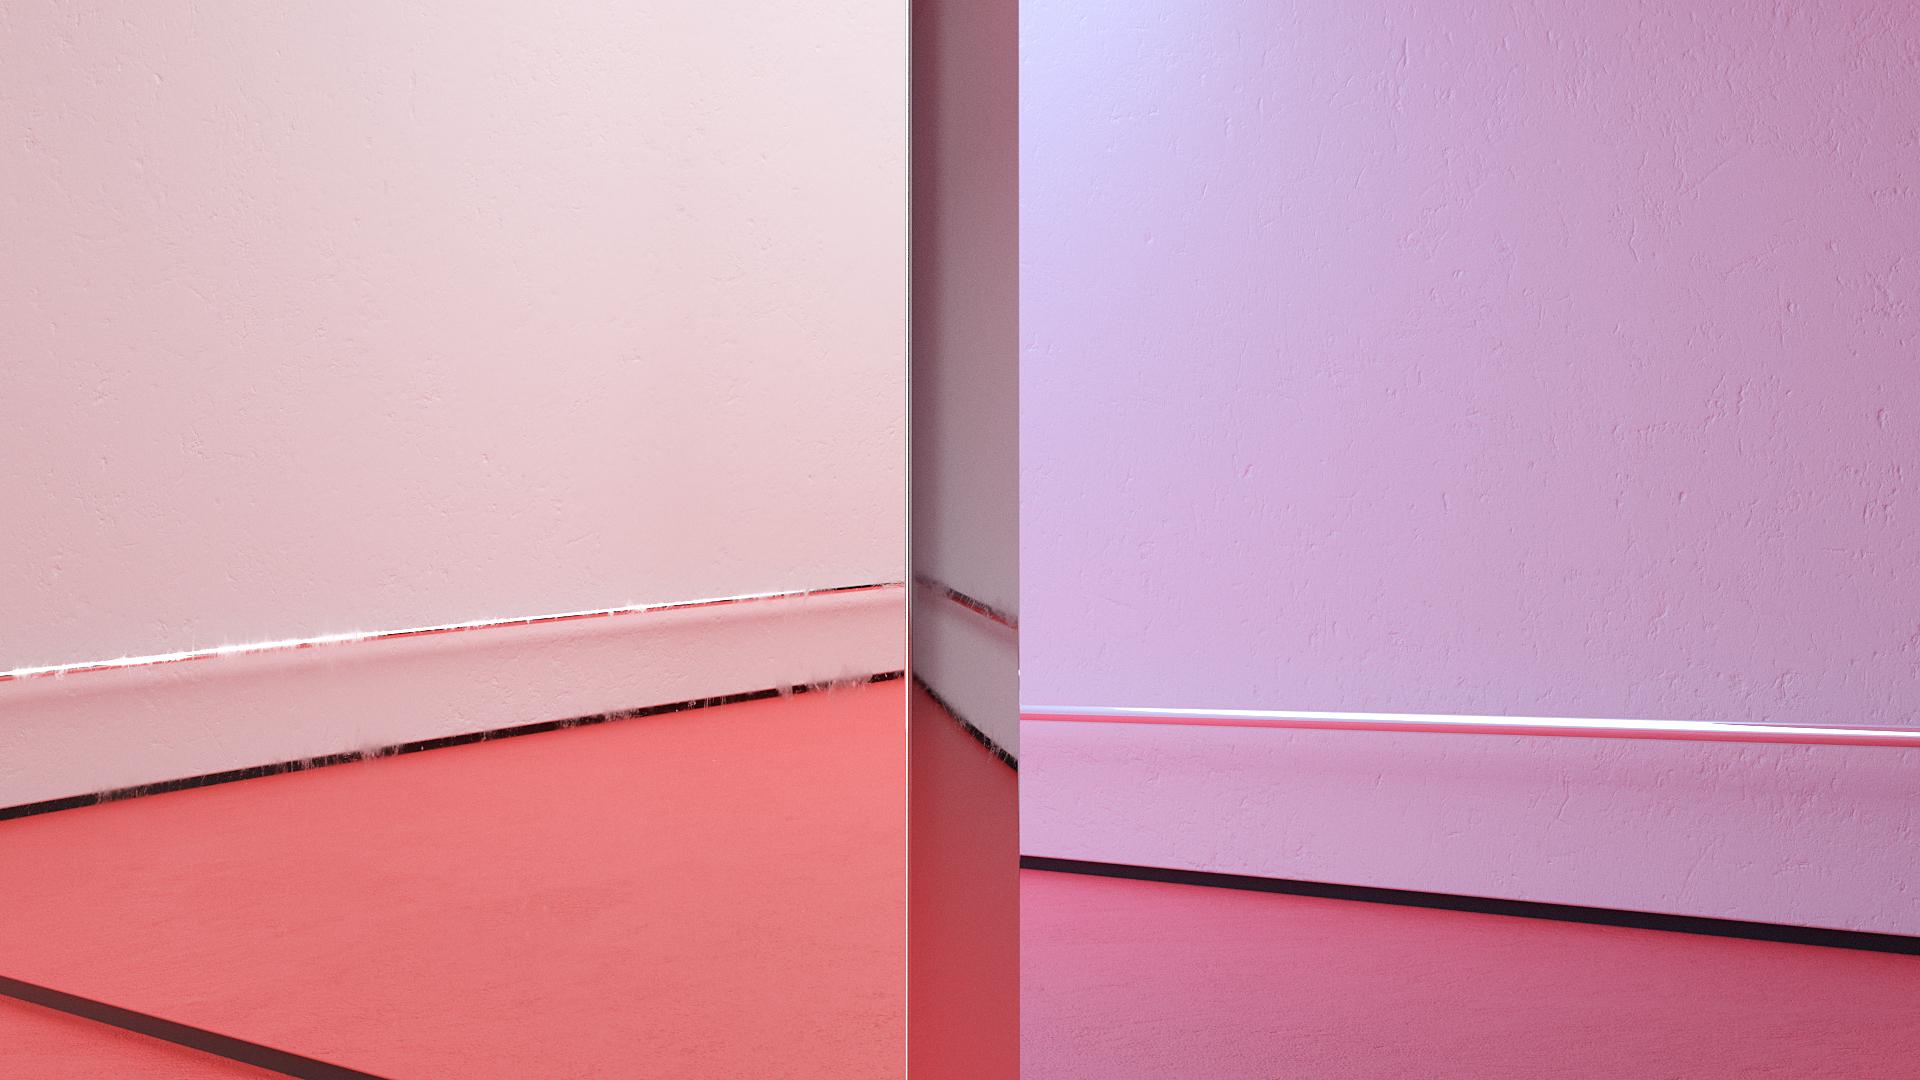 Interiors_TestA_001.jpg